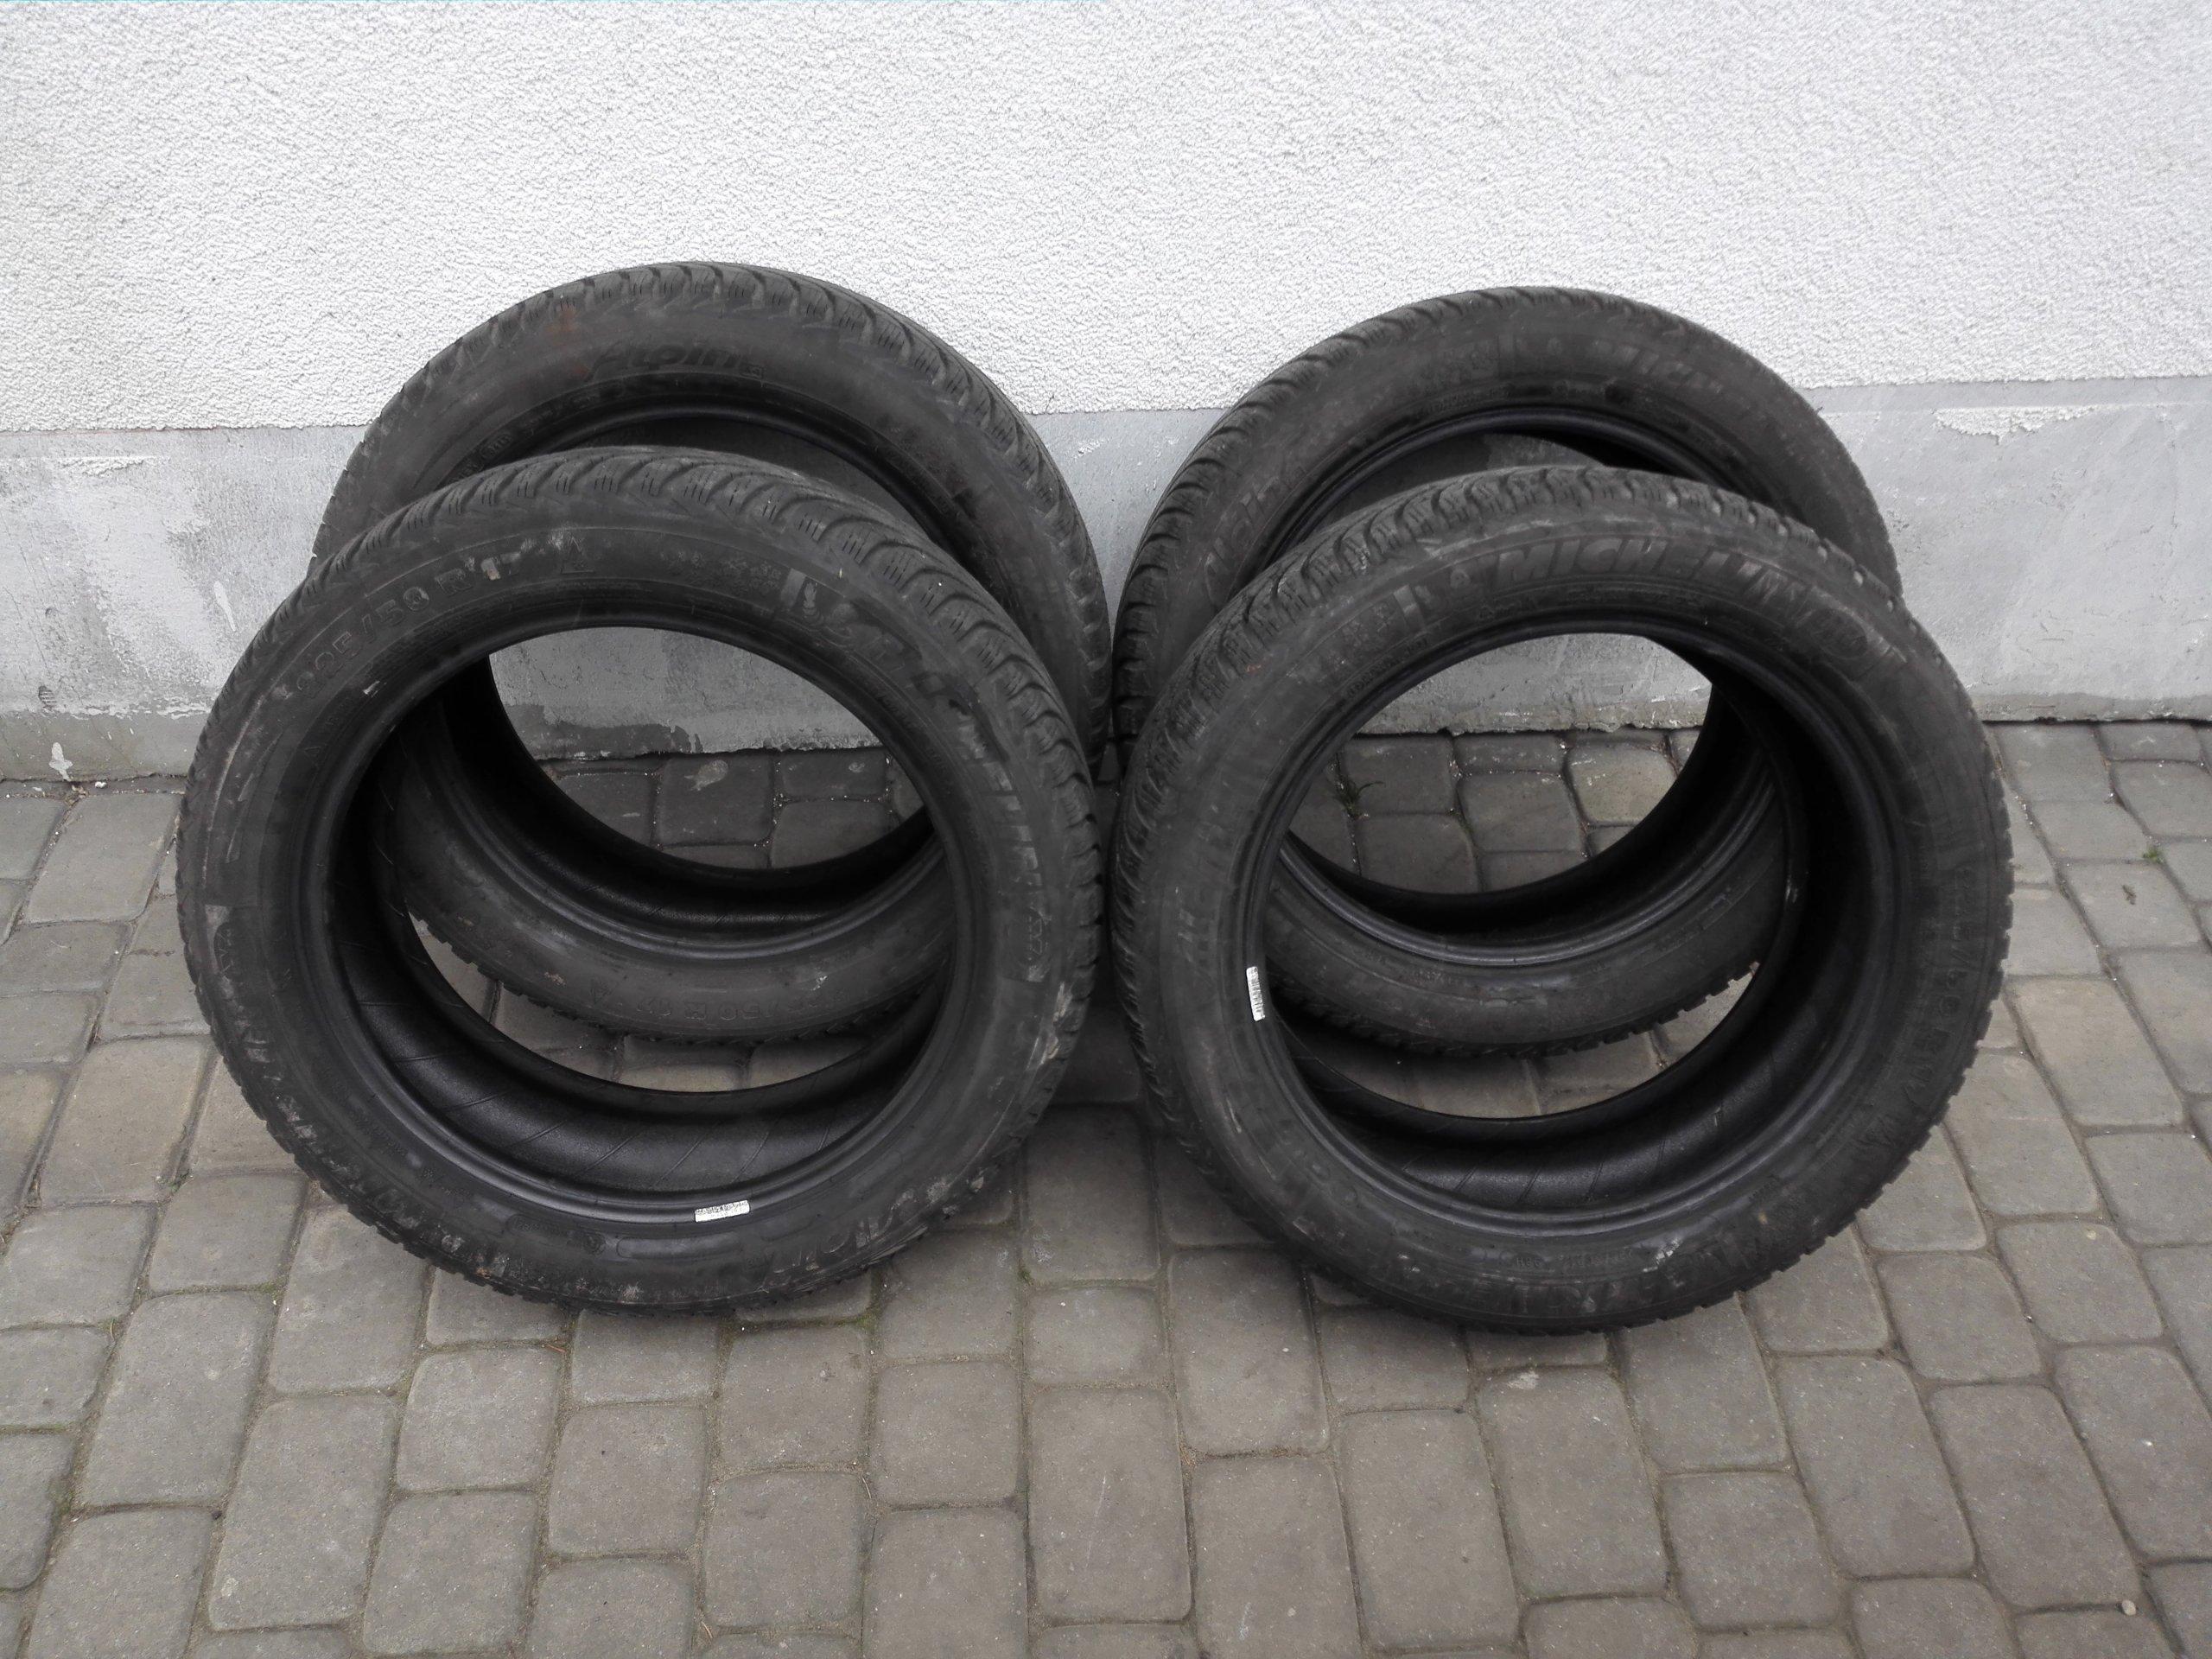 Opony Zimowe Michelin Alpin 2255017 98h 2013 65 7283430689